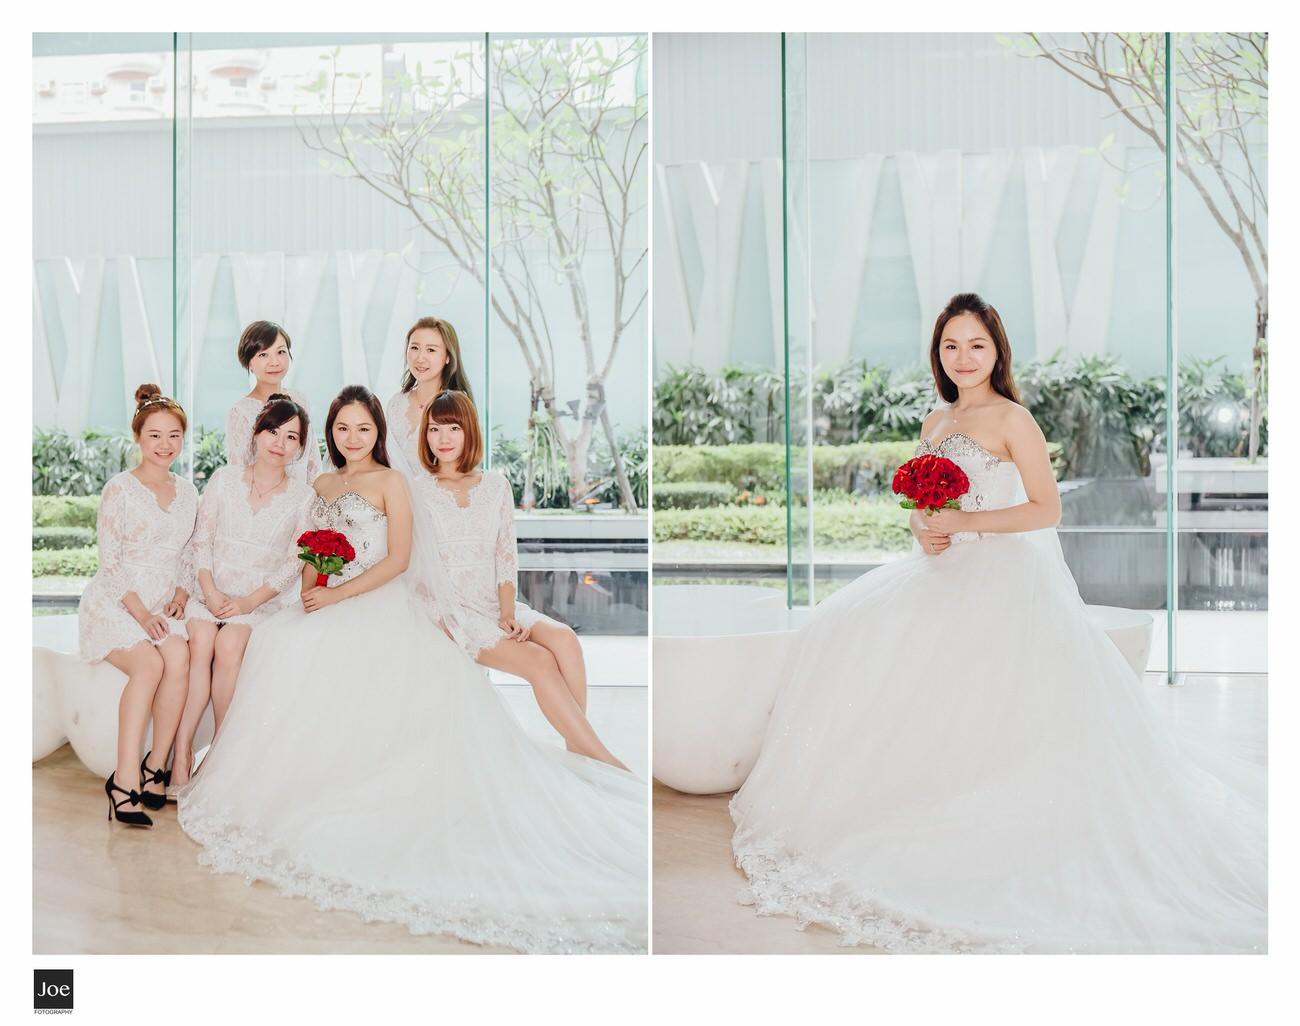 grand-hilai-hotel-wedding-daniel-yvette-joe-fotography-093.jpg